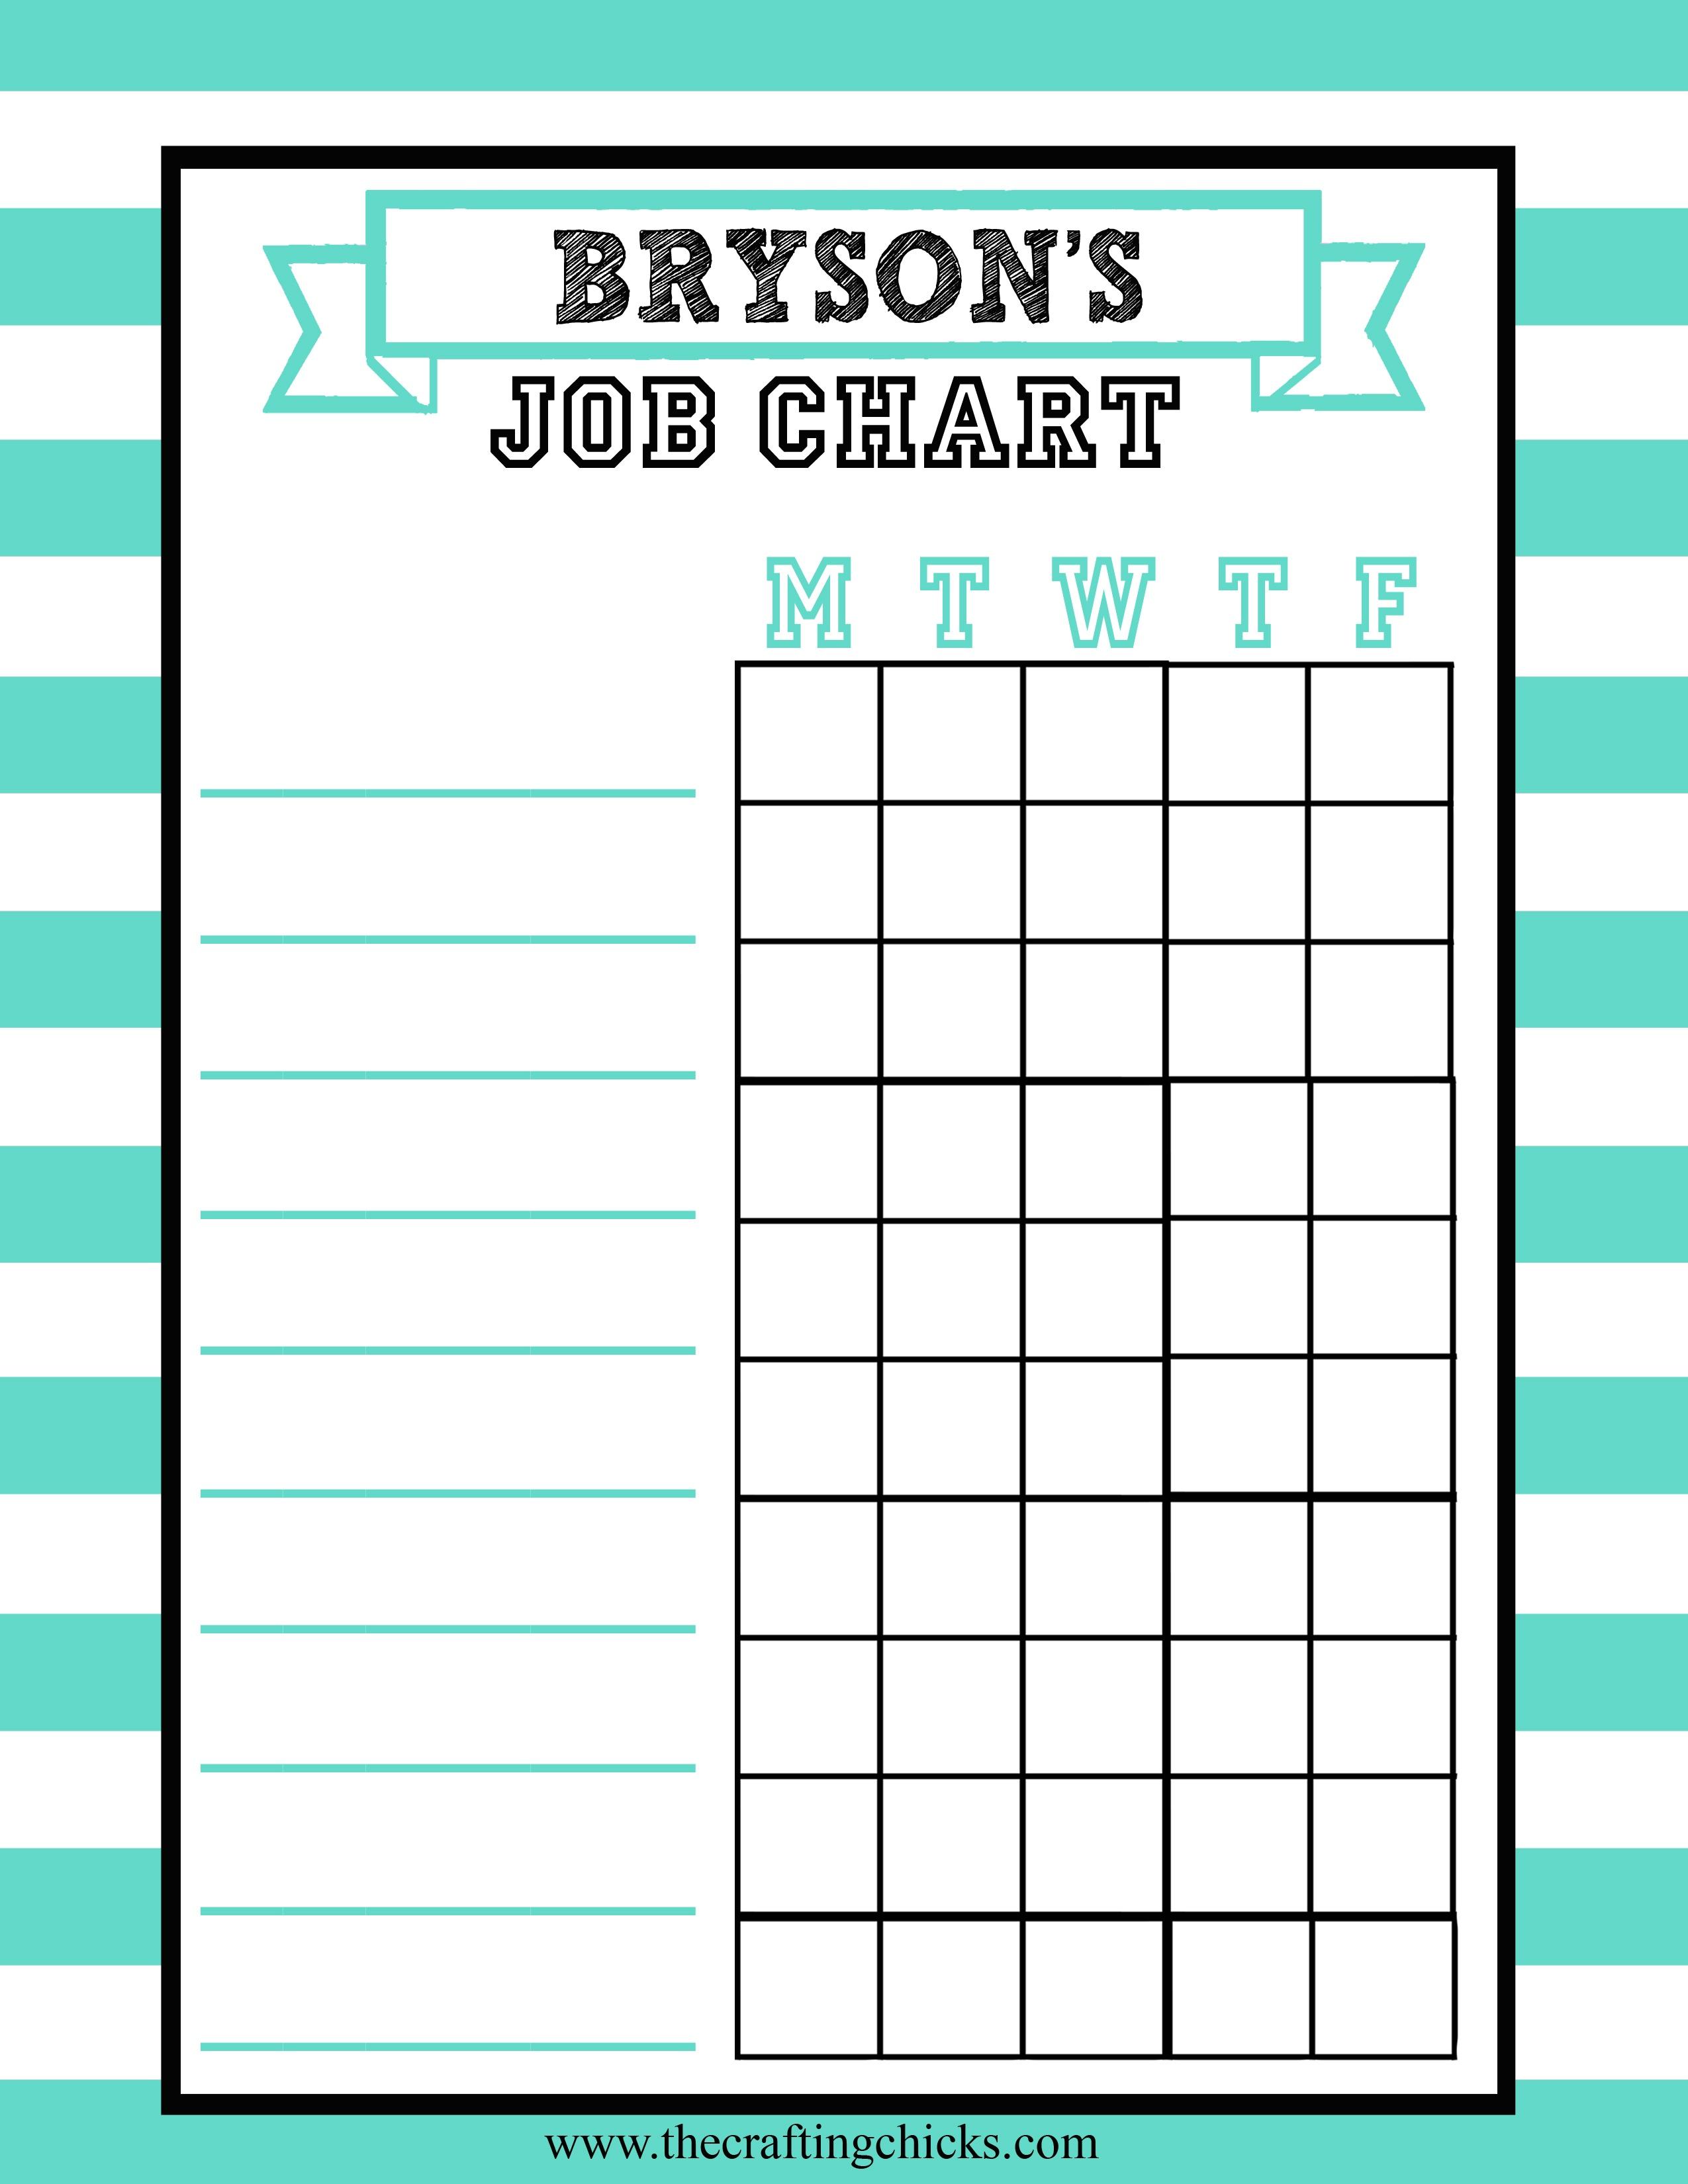 Job Charts Free Printable - The Crafting Chicks - Free Printable To Do Charts